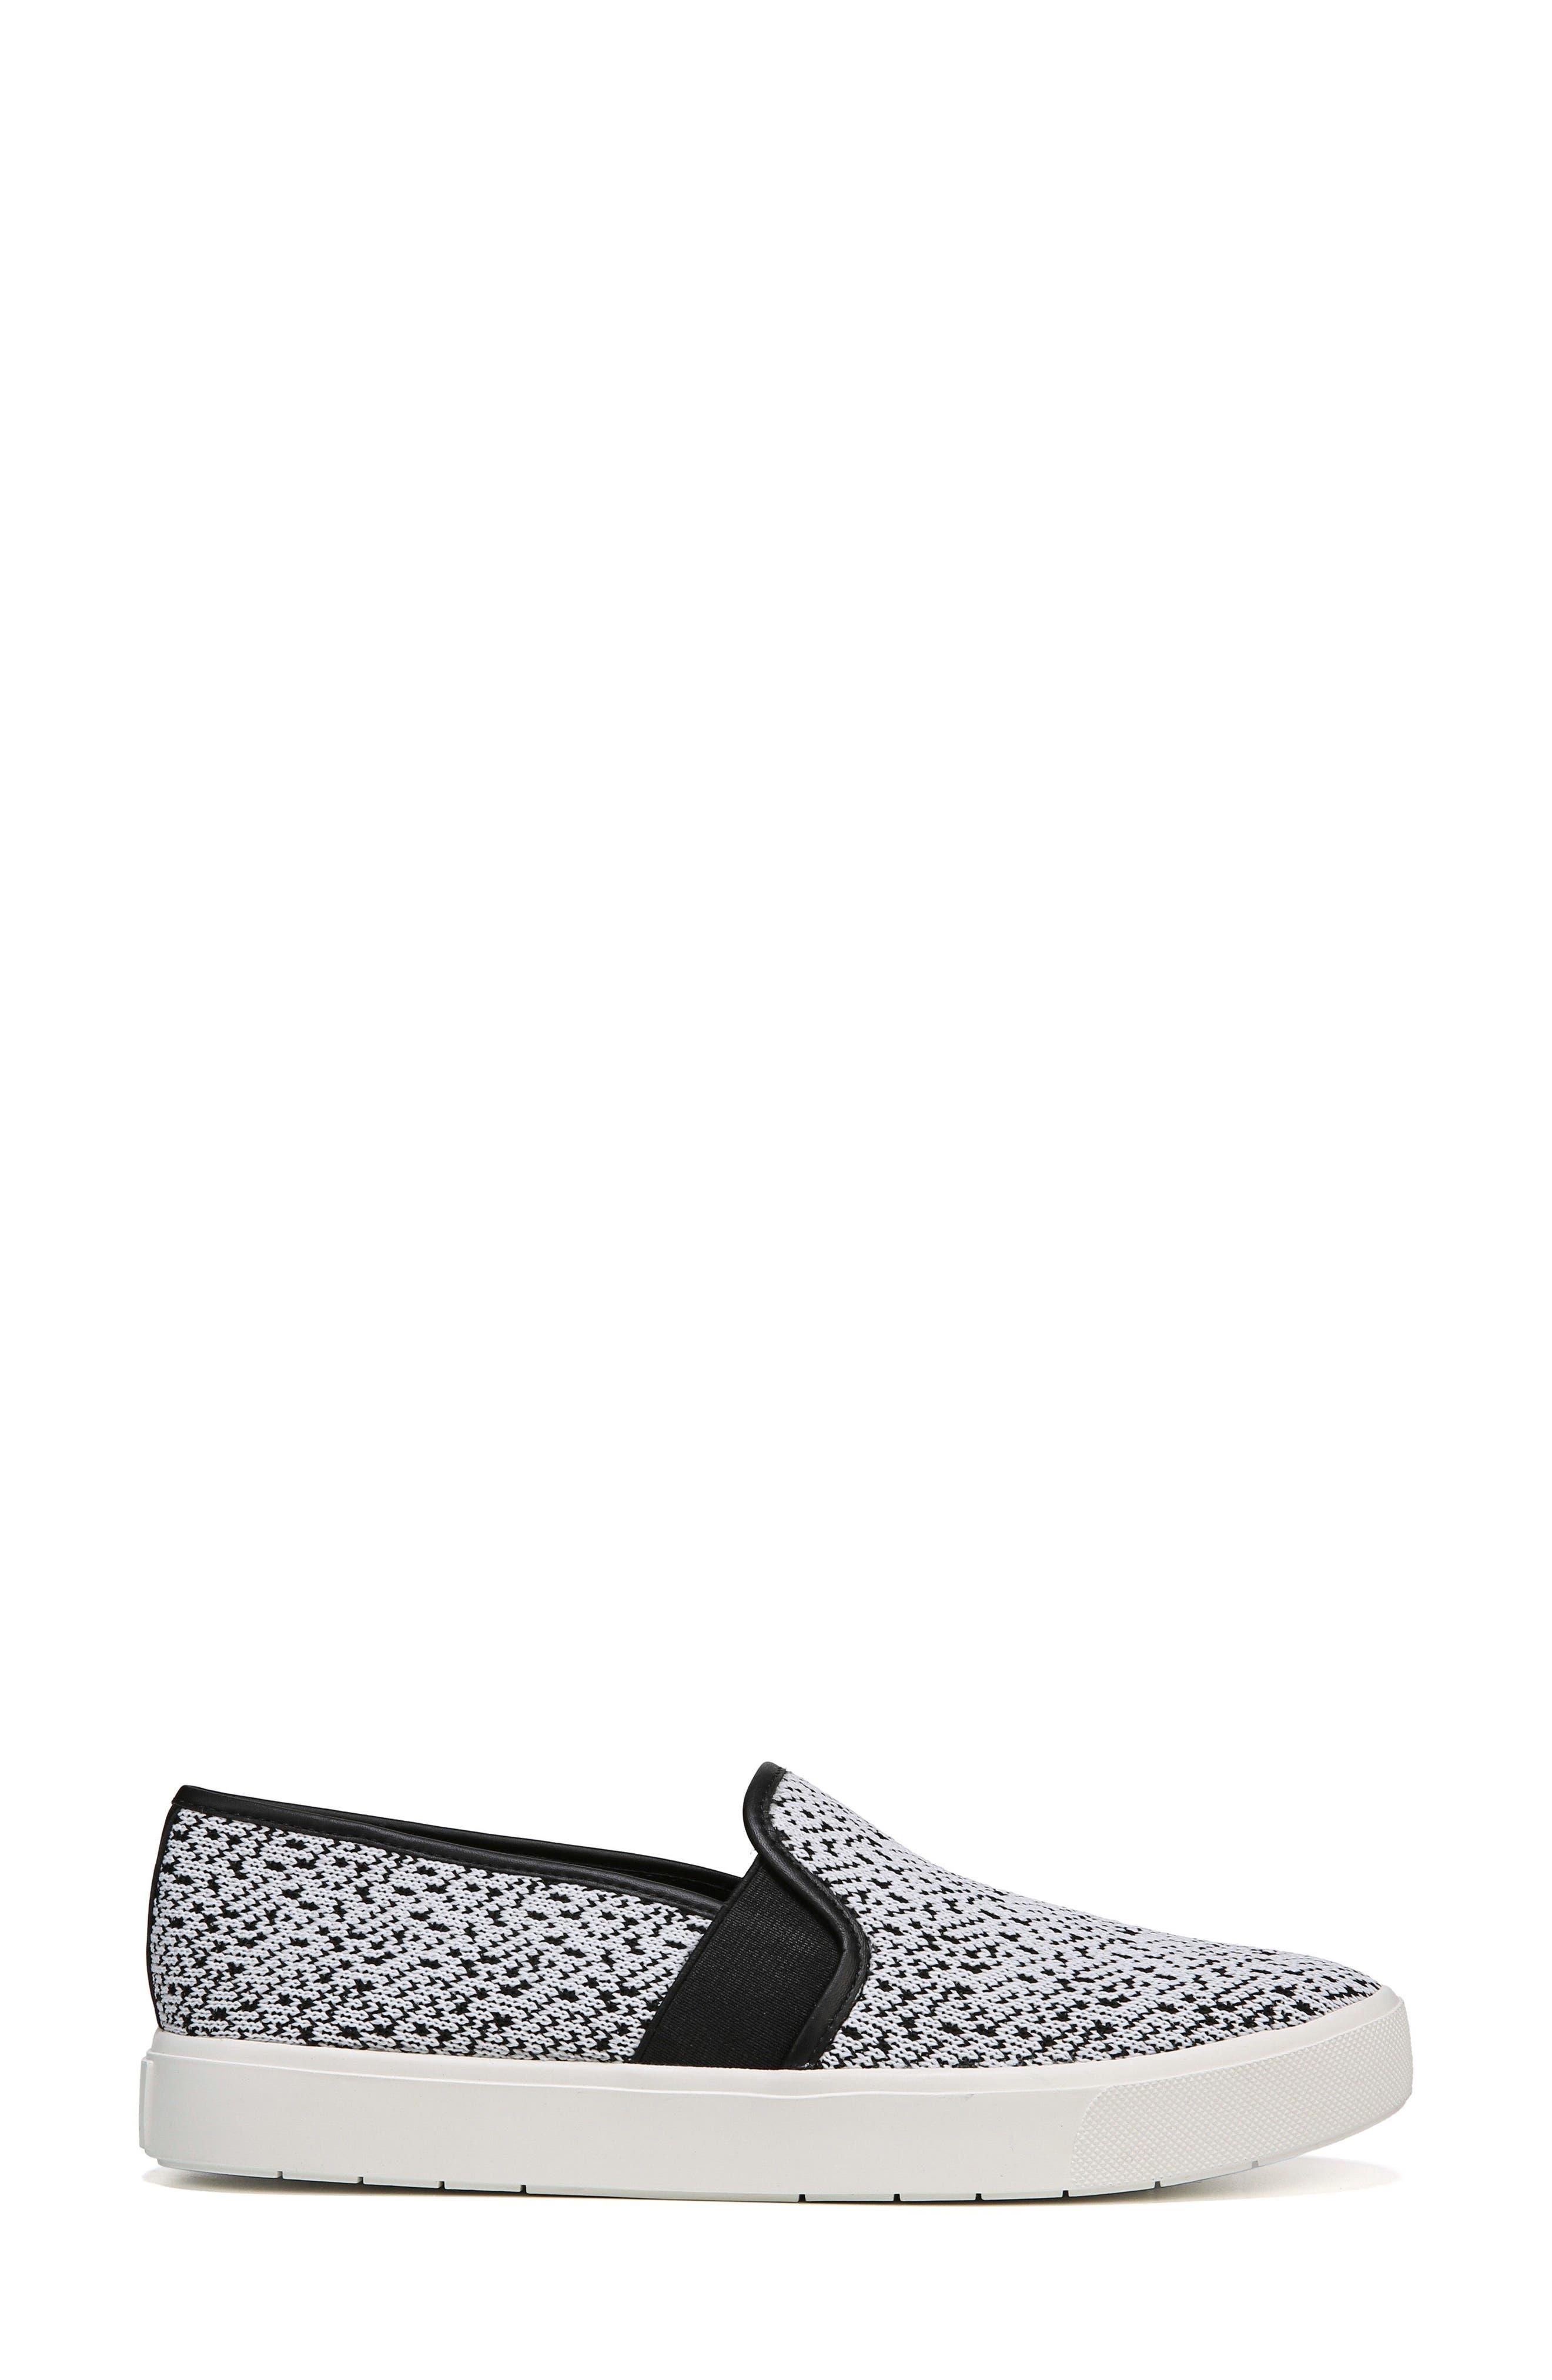 'Blair 12' Leather Slip-On Sneaker,                             Alternate thumbnail 3, color,                             WHITE/ BLACK YETI KNIT